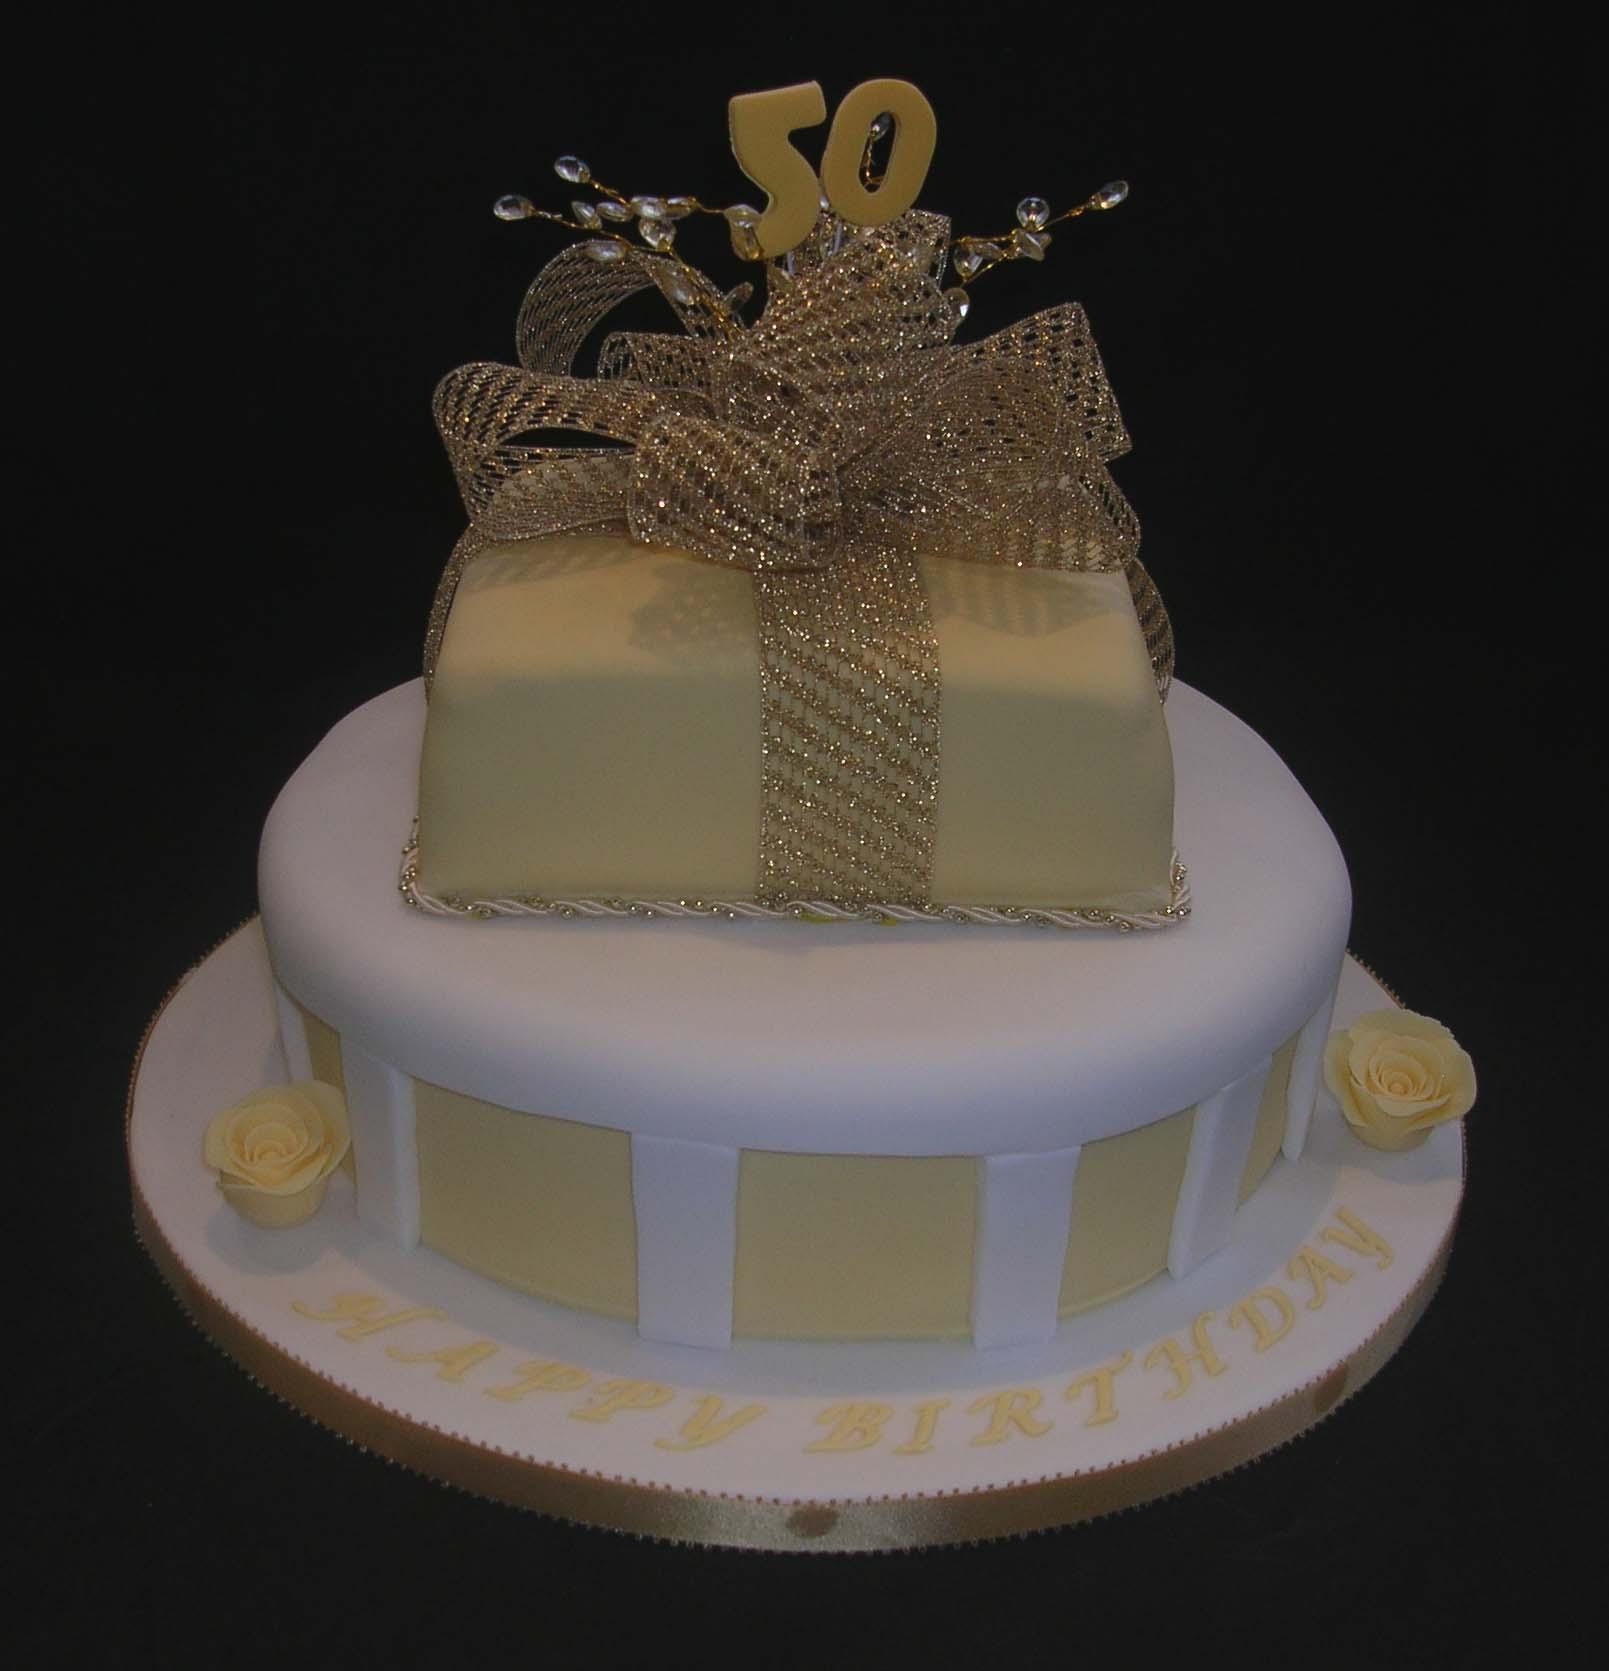 Sensational 8 Creative 50Th Birthday Cakes Photo Funny 50Th Birthday Cake Birthday Cards Printable Opercafe Filternl